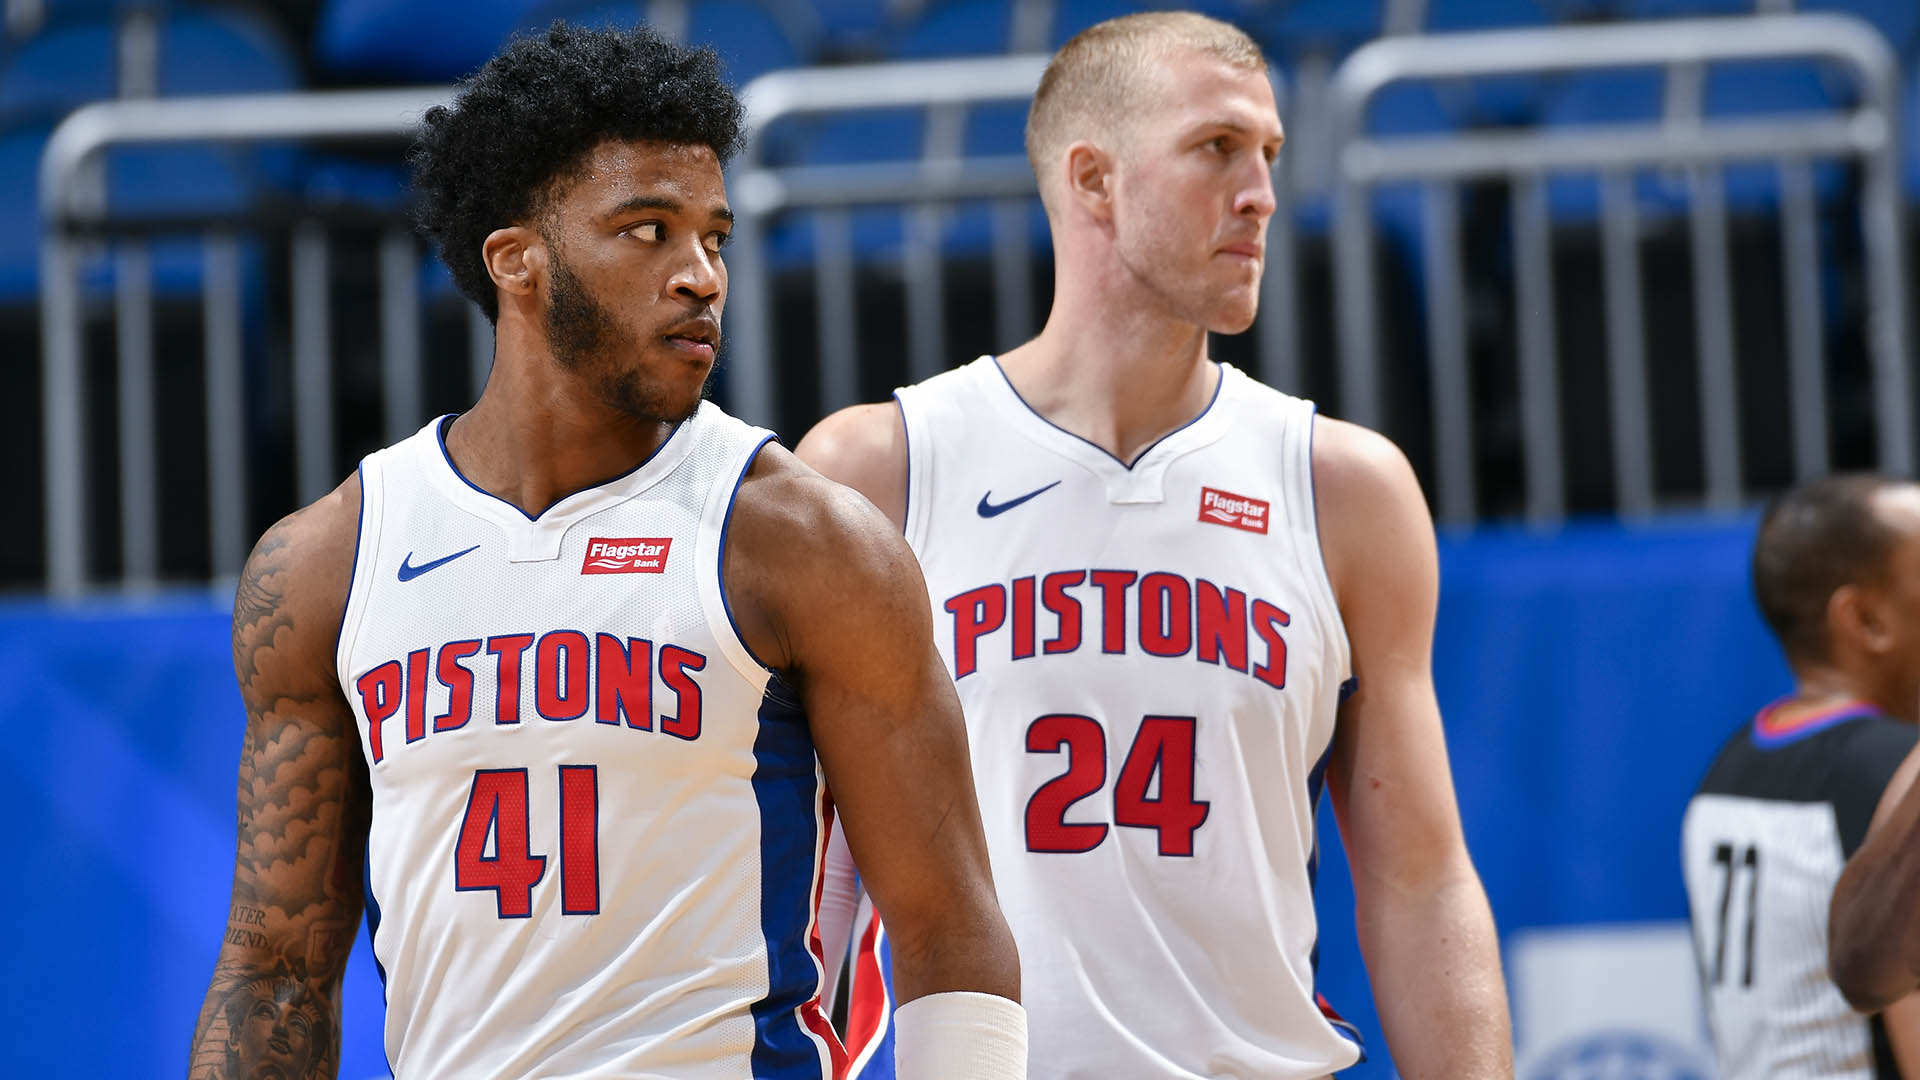 2021 Midseason report: Detroit Pistons